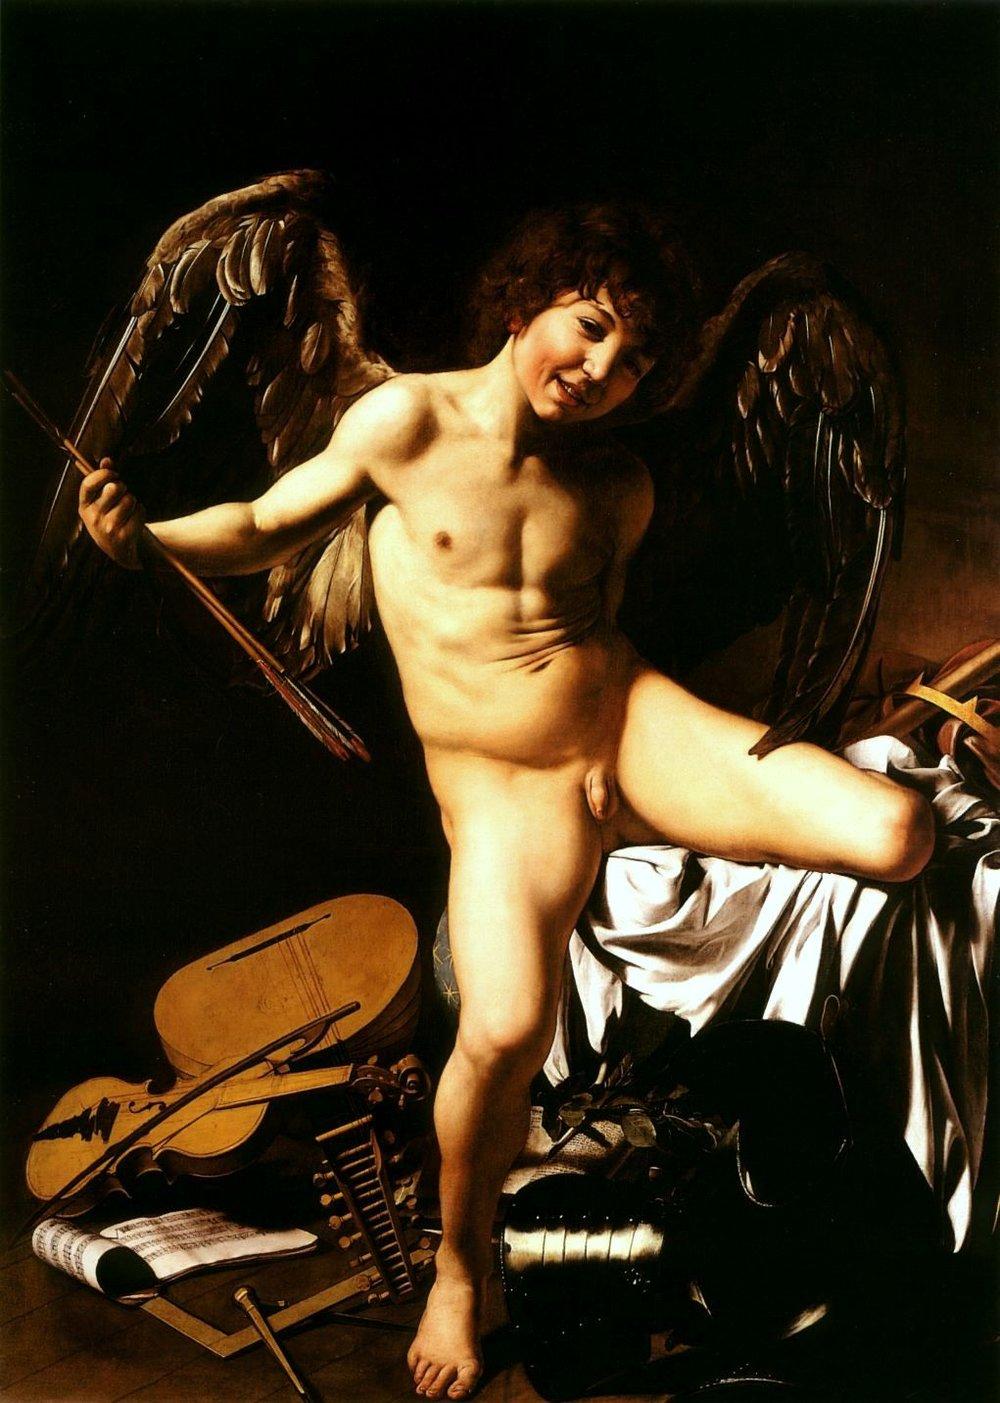 Love Victorious , Michelangelo Merisi da Caravaggio, 1602, Staatliche Museen, Berlin